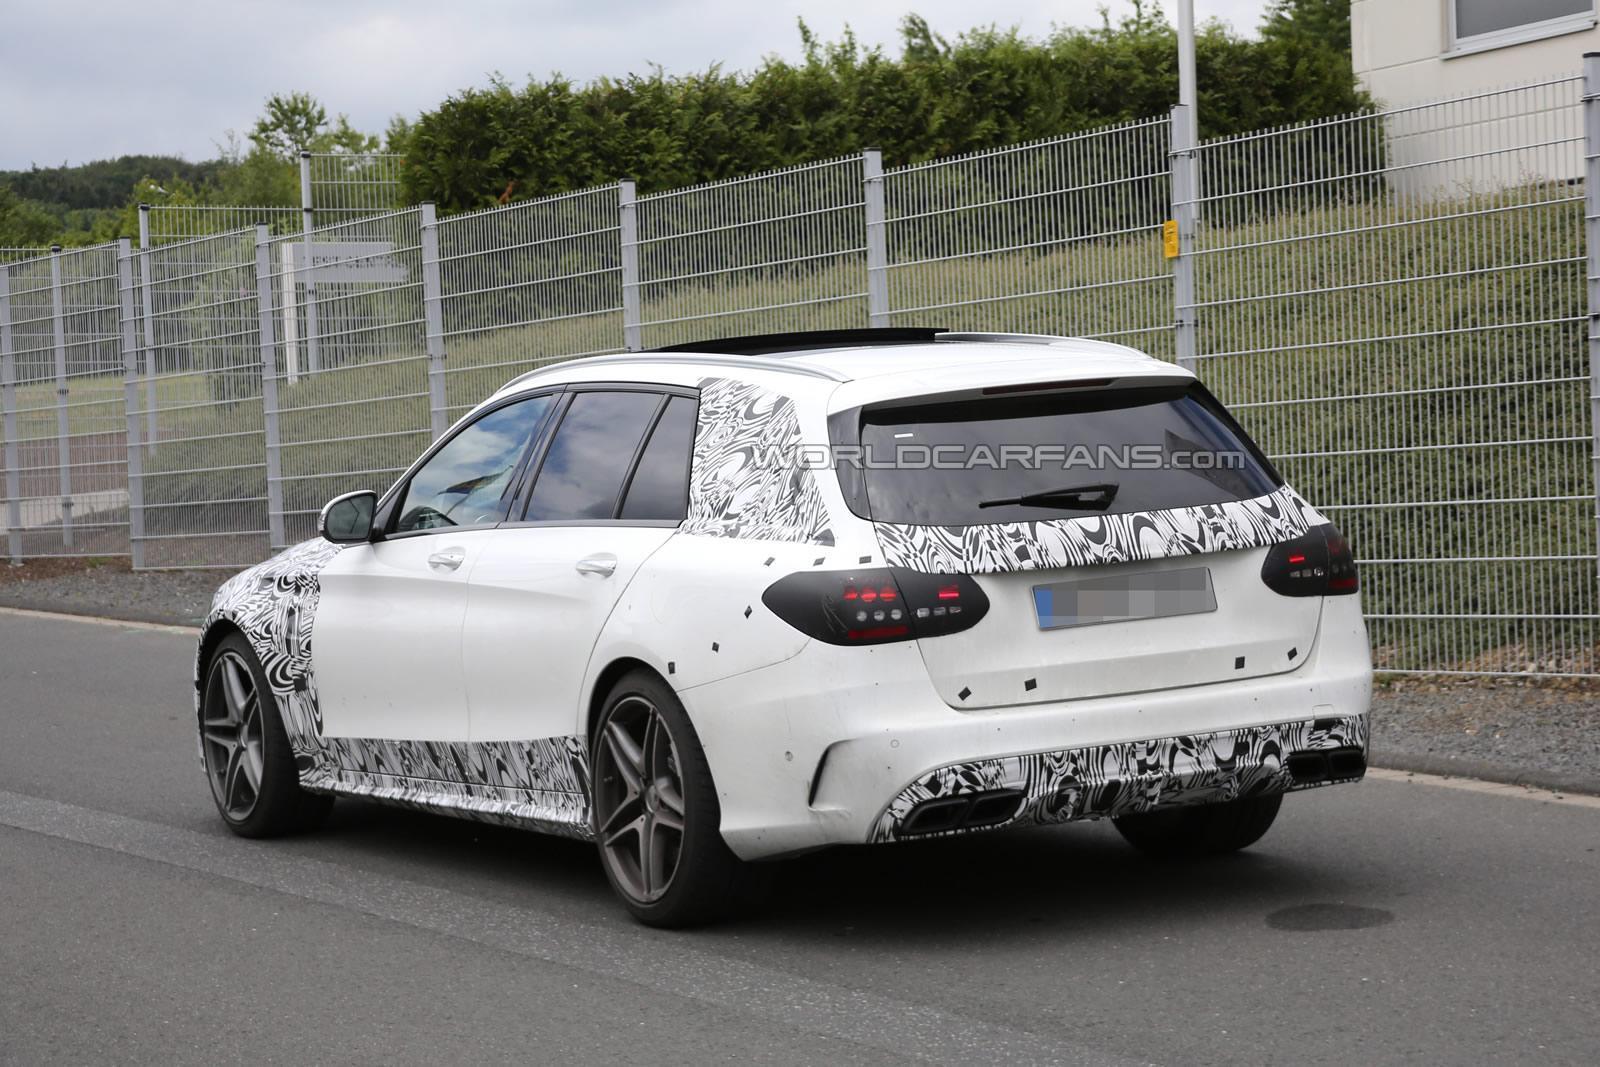 (S205): Protótipos da C63 flagrados em testes em Nürburgring C63-amg-estate-6-30-5